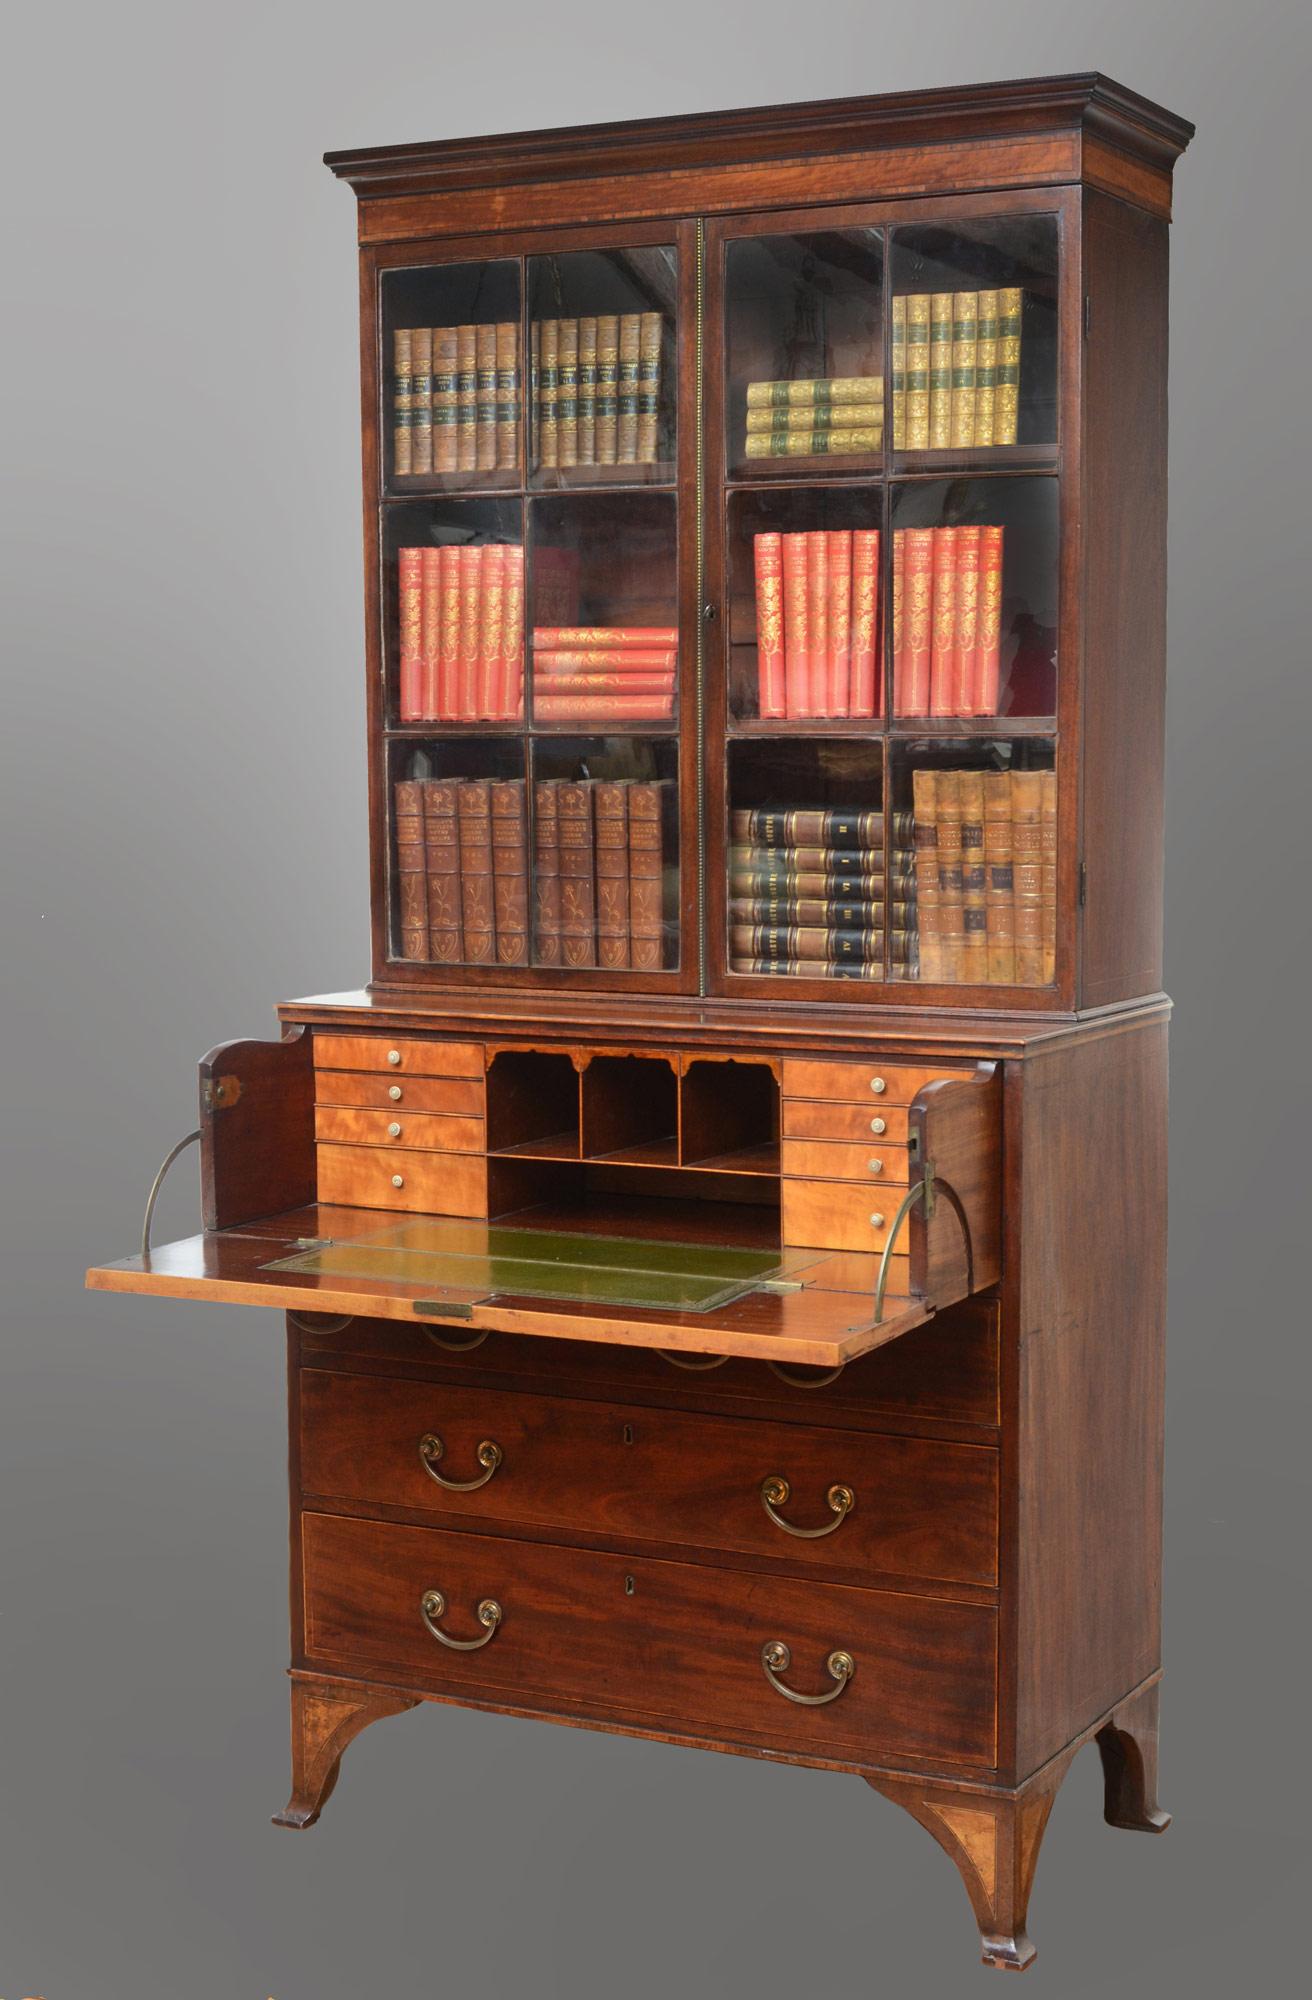 187 Product 187 English Antique Georgian Secretaire Bookcase